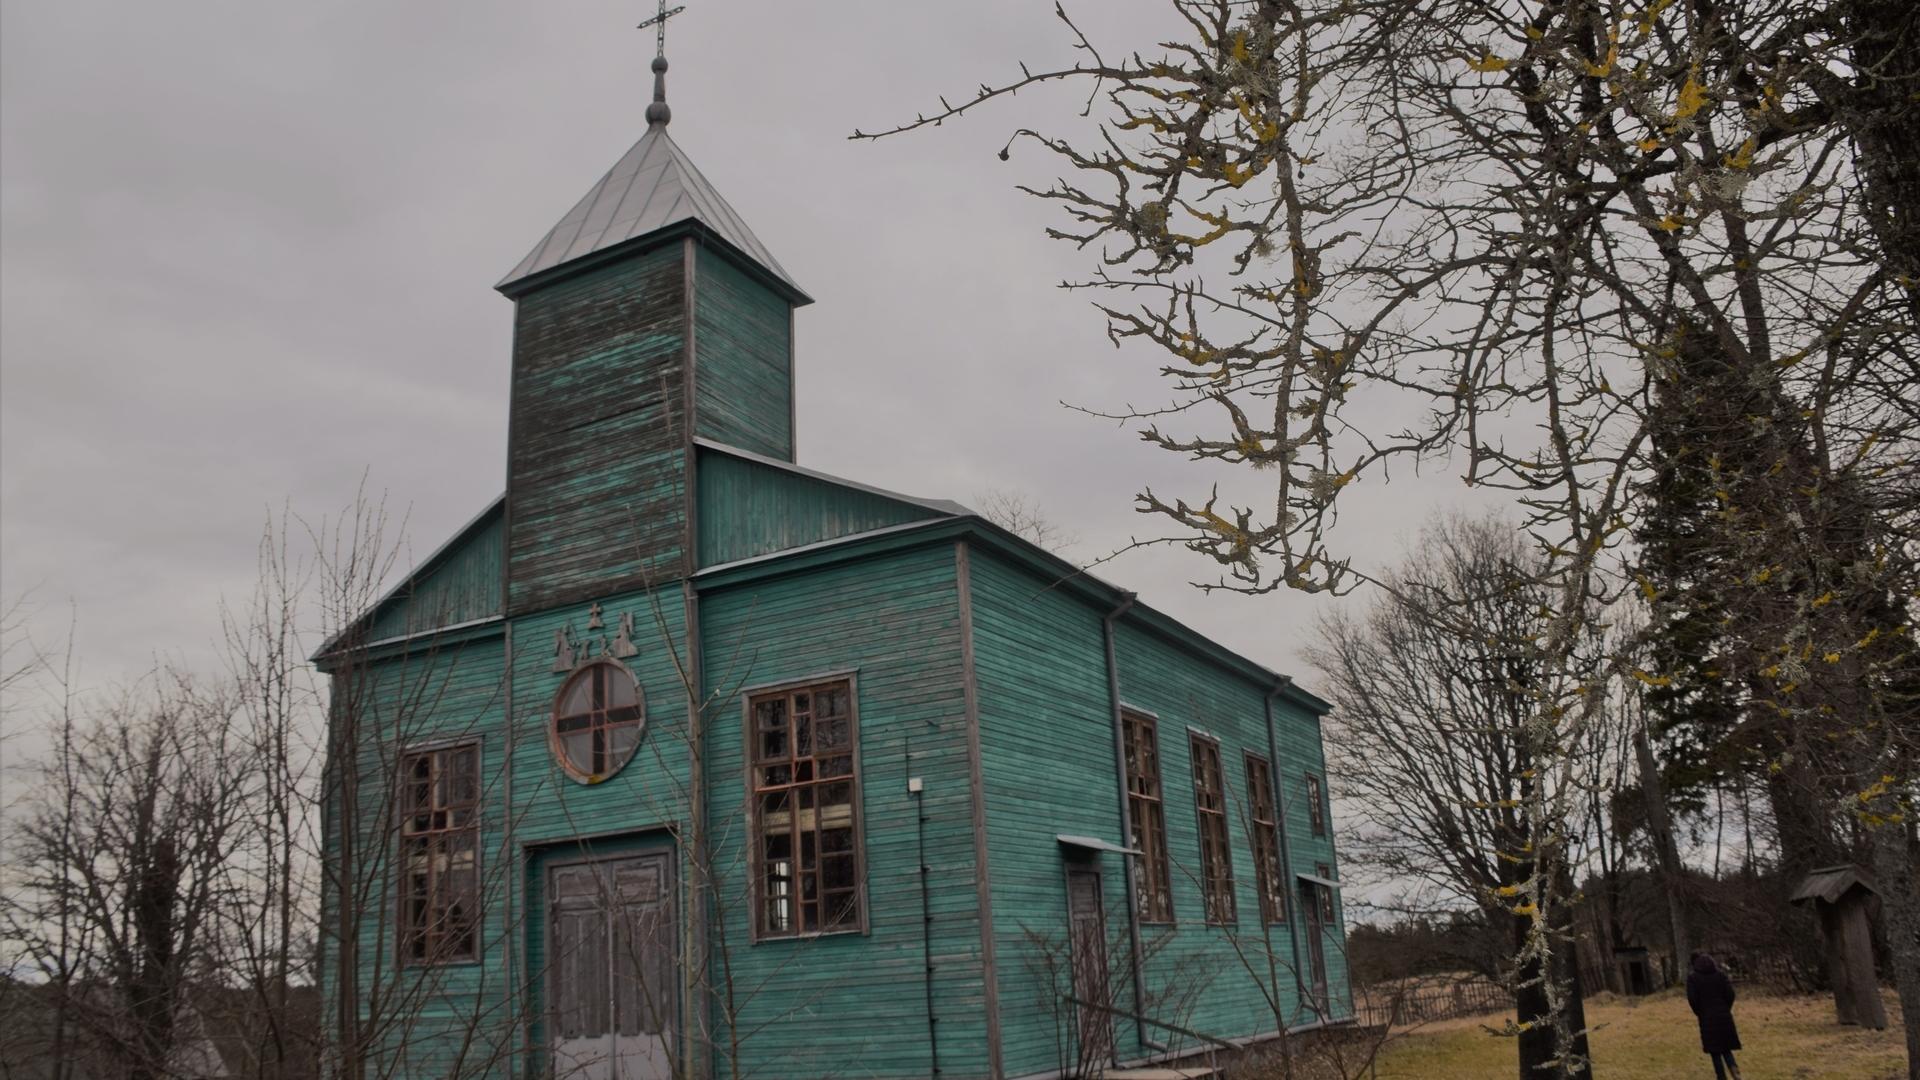 Daunoriai St. Sacred Heart of Jesus Parish Church